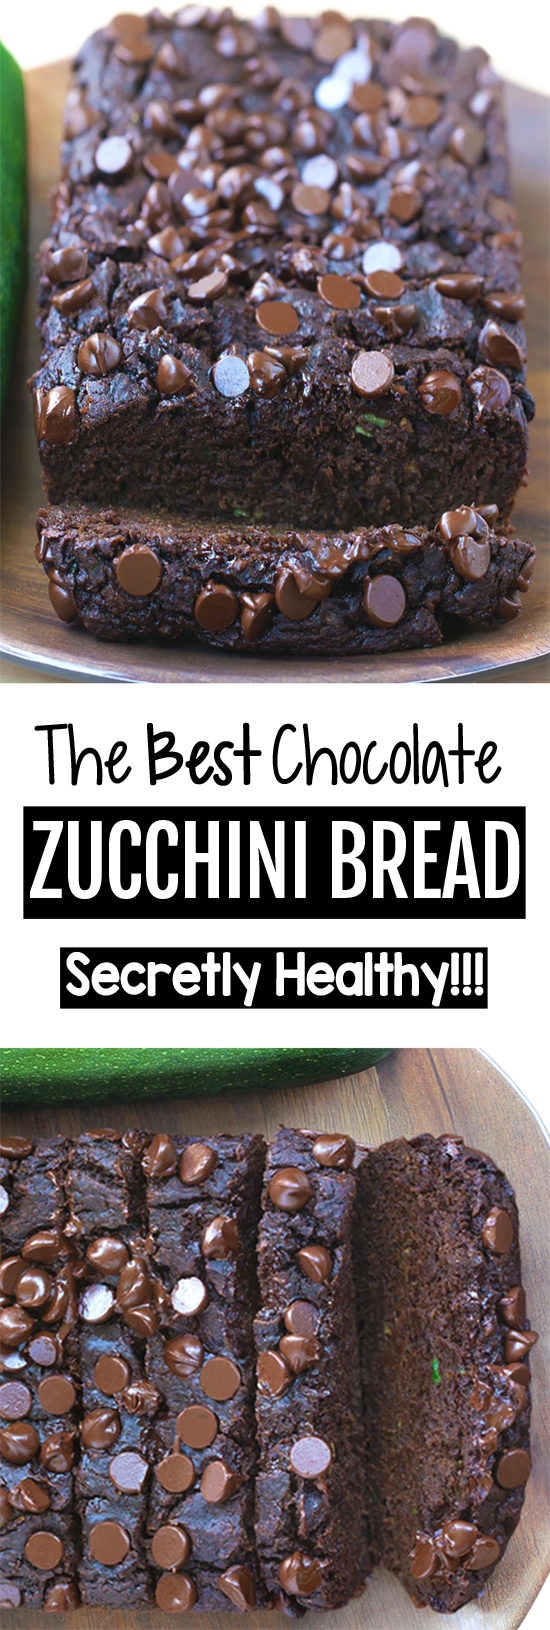 The Best Double Chocolate Zucchini Bread Recipe